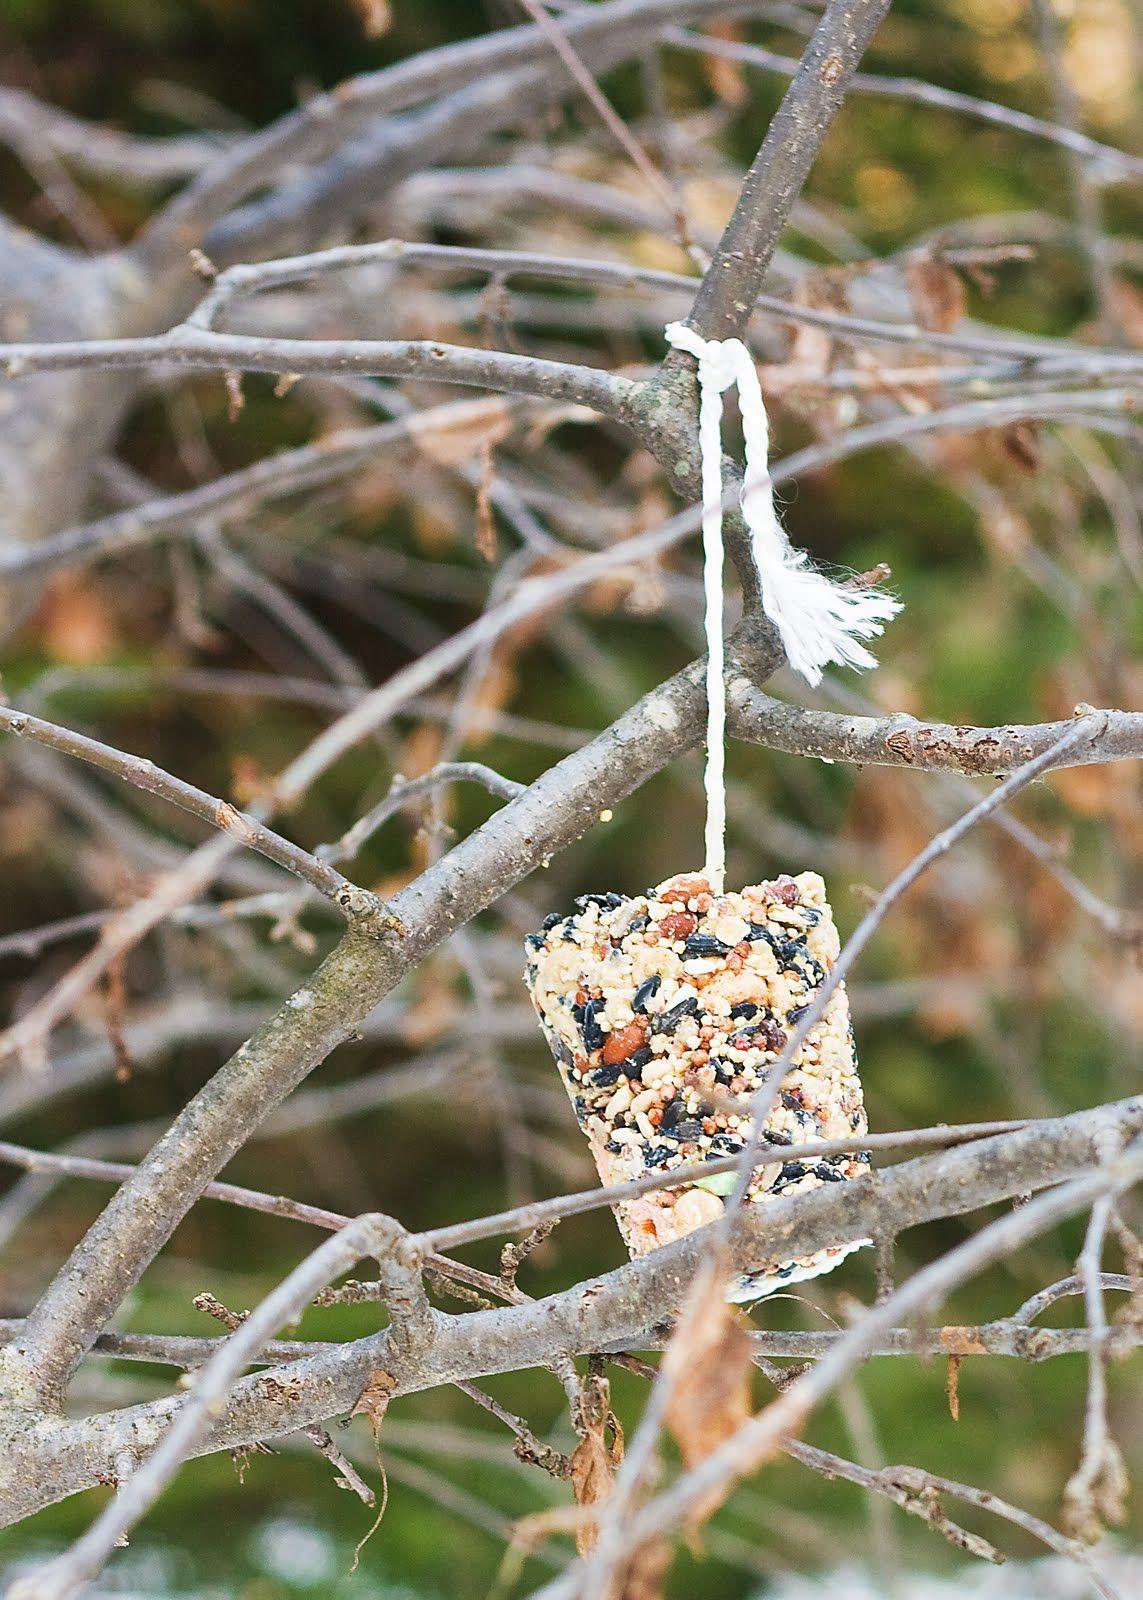 Homemade Bird Suet Great Kid Project For Winter A